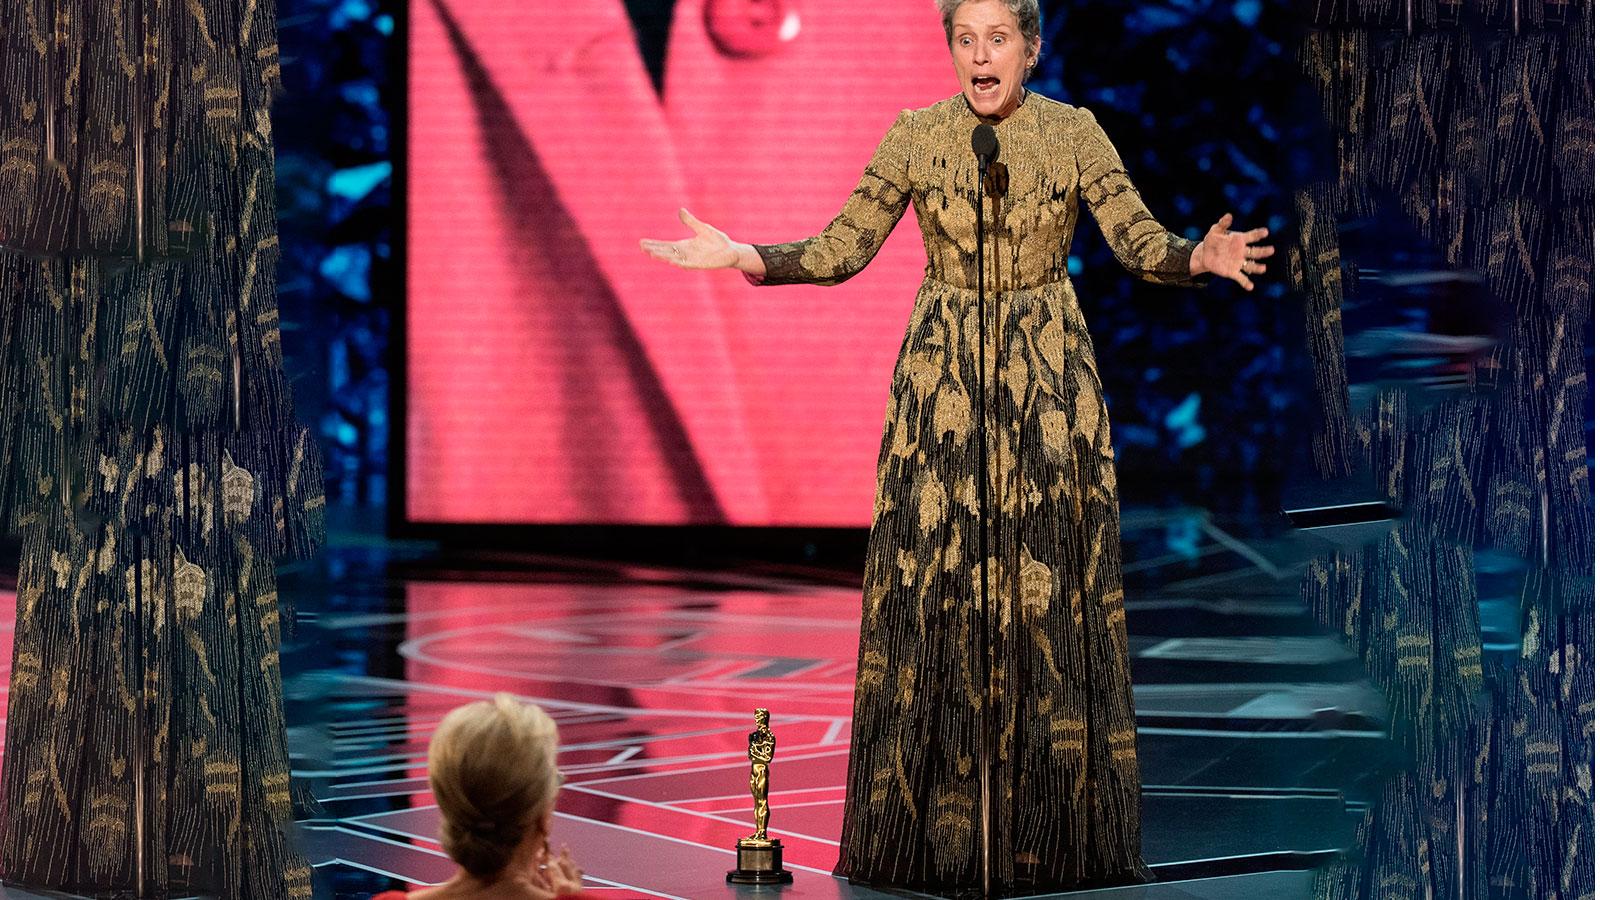 Frances McDormand dio un aplaudido discurso feminista.